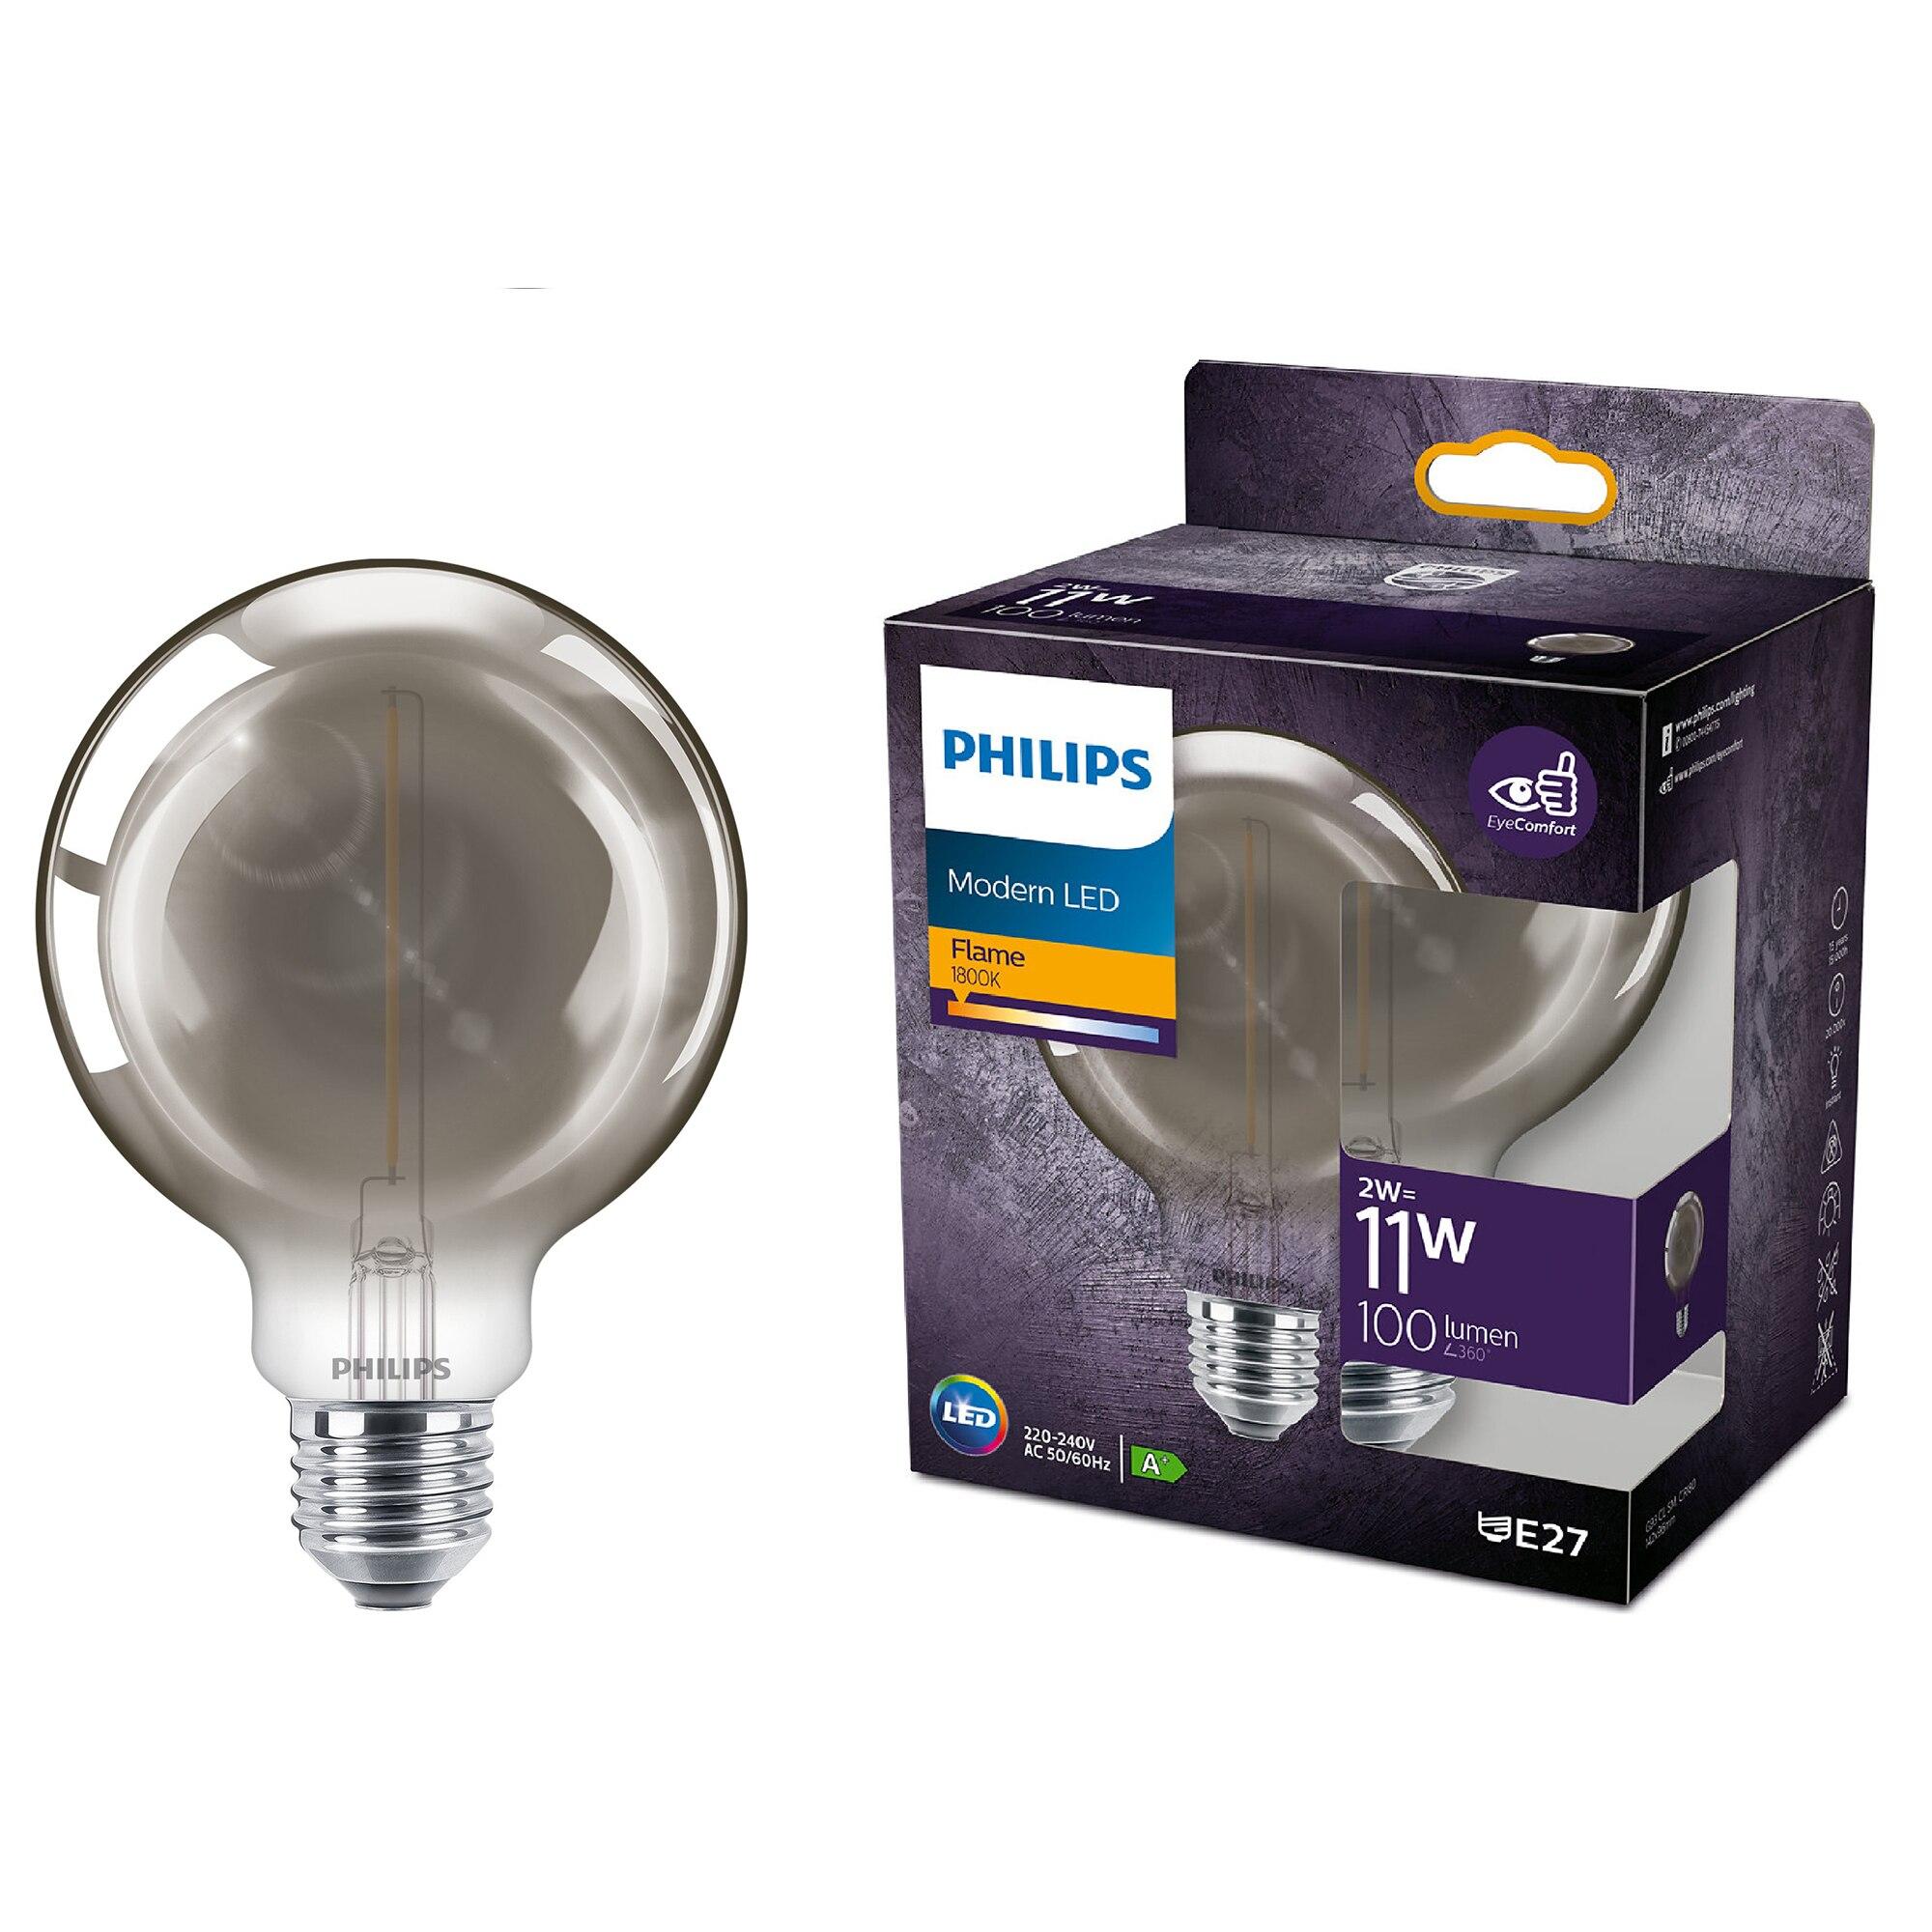 Fotografie Bec LED vintage (decorativ) Philips Classic, EyeComfort, G93, E27, 2 W (11W), 100 lm, lumina calda flacara (1800K), Smoky, 14.2 cm